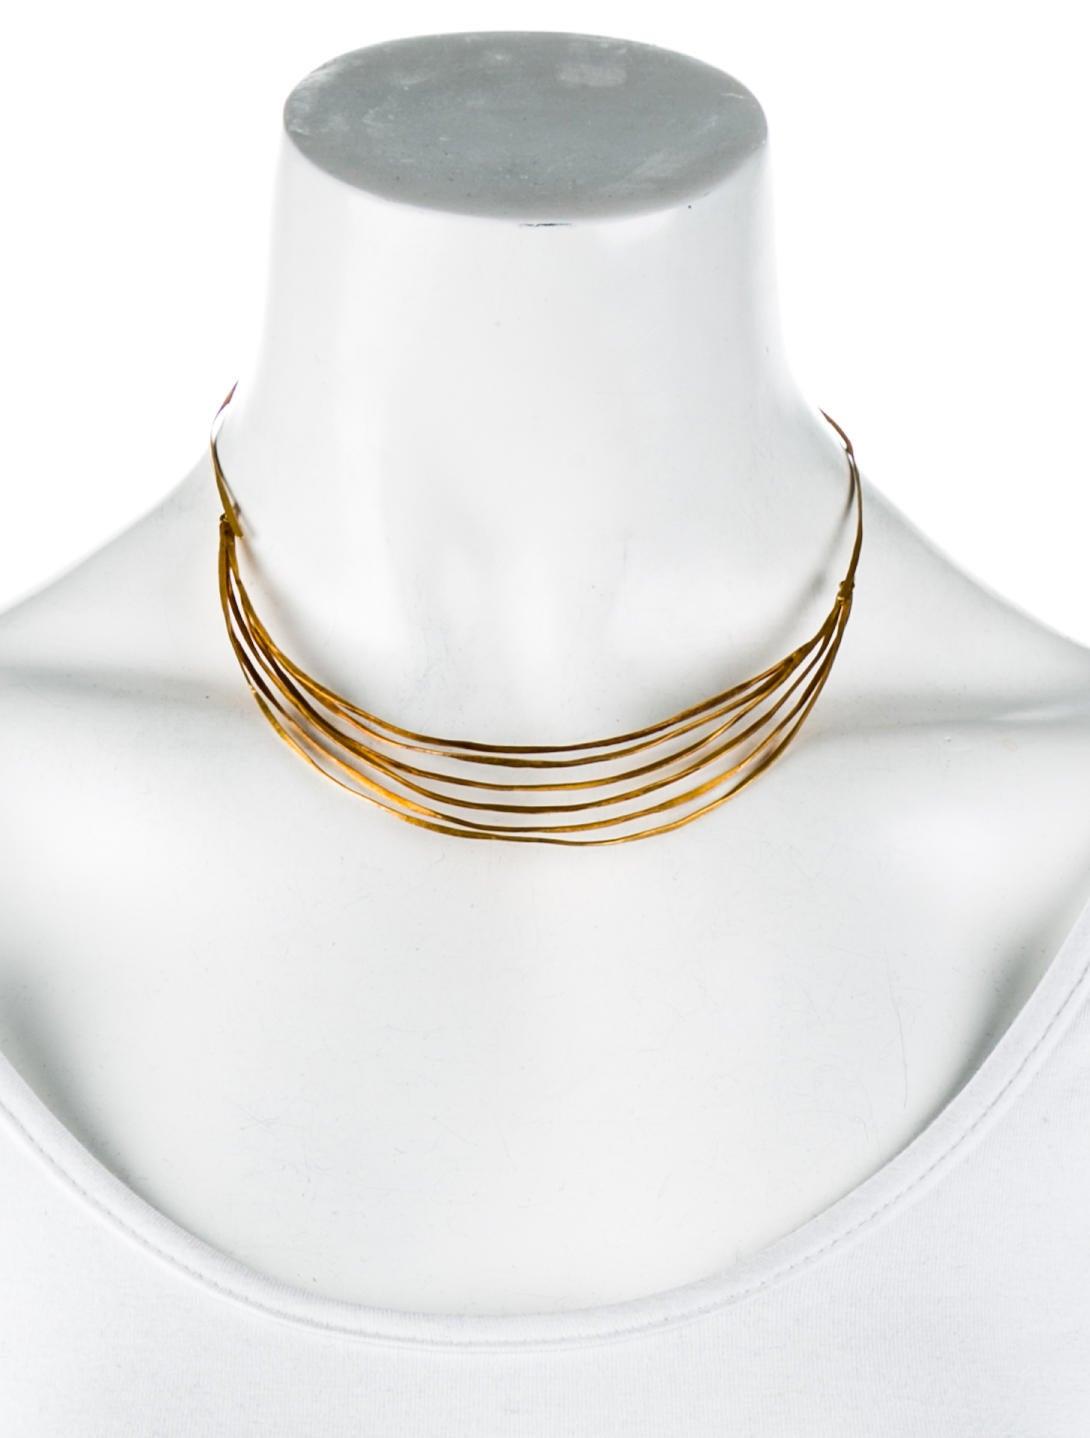 18K Wire Collar - Necklaces - NECKL39088 | The RealReal